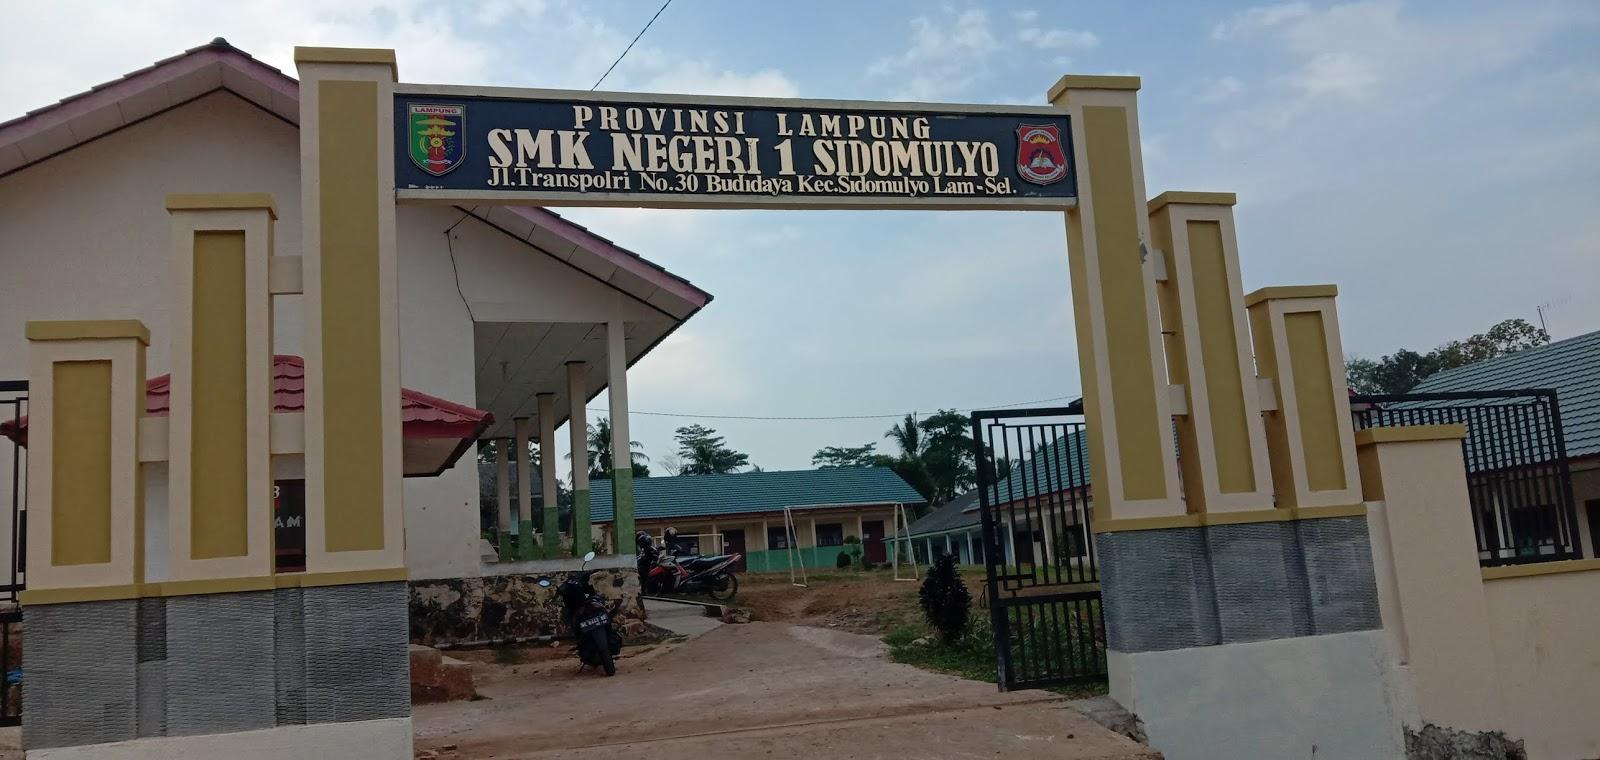 Lowongan Kerja SMK NEGERI 1 SIDOMULYO